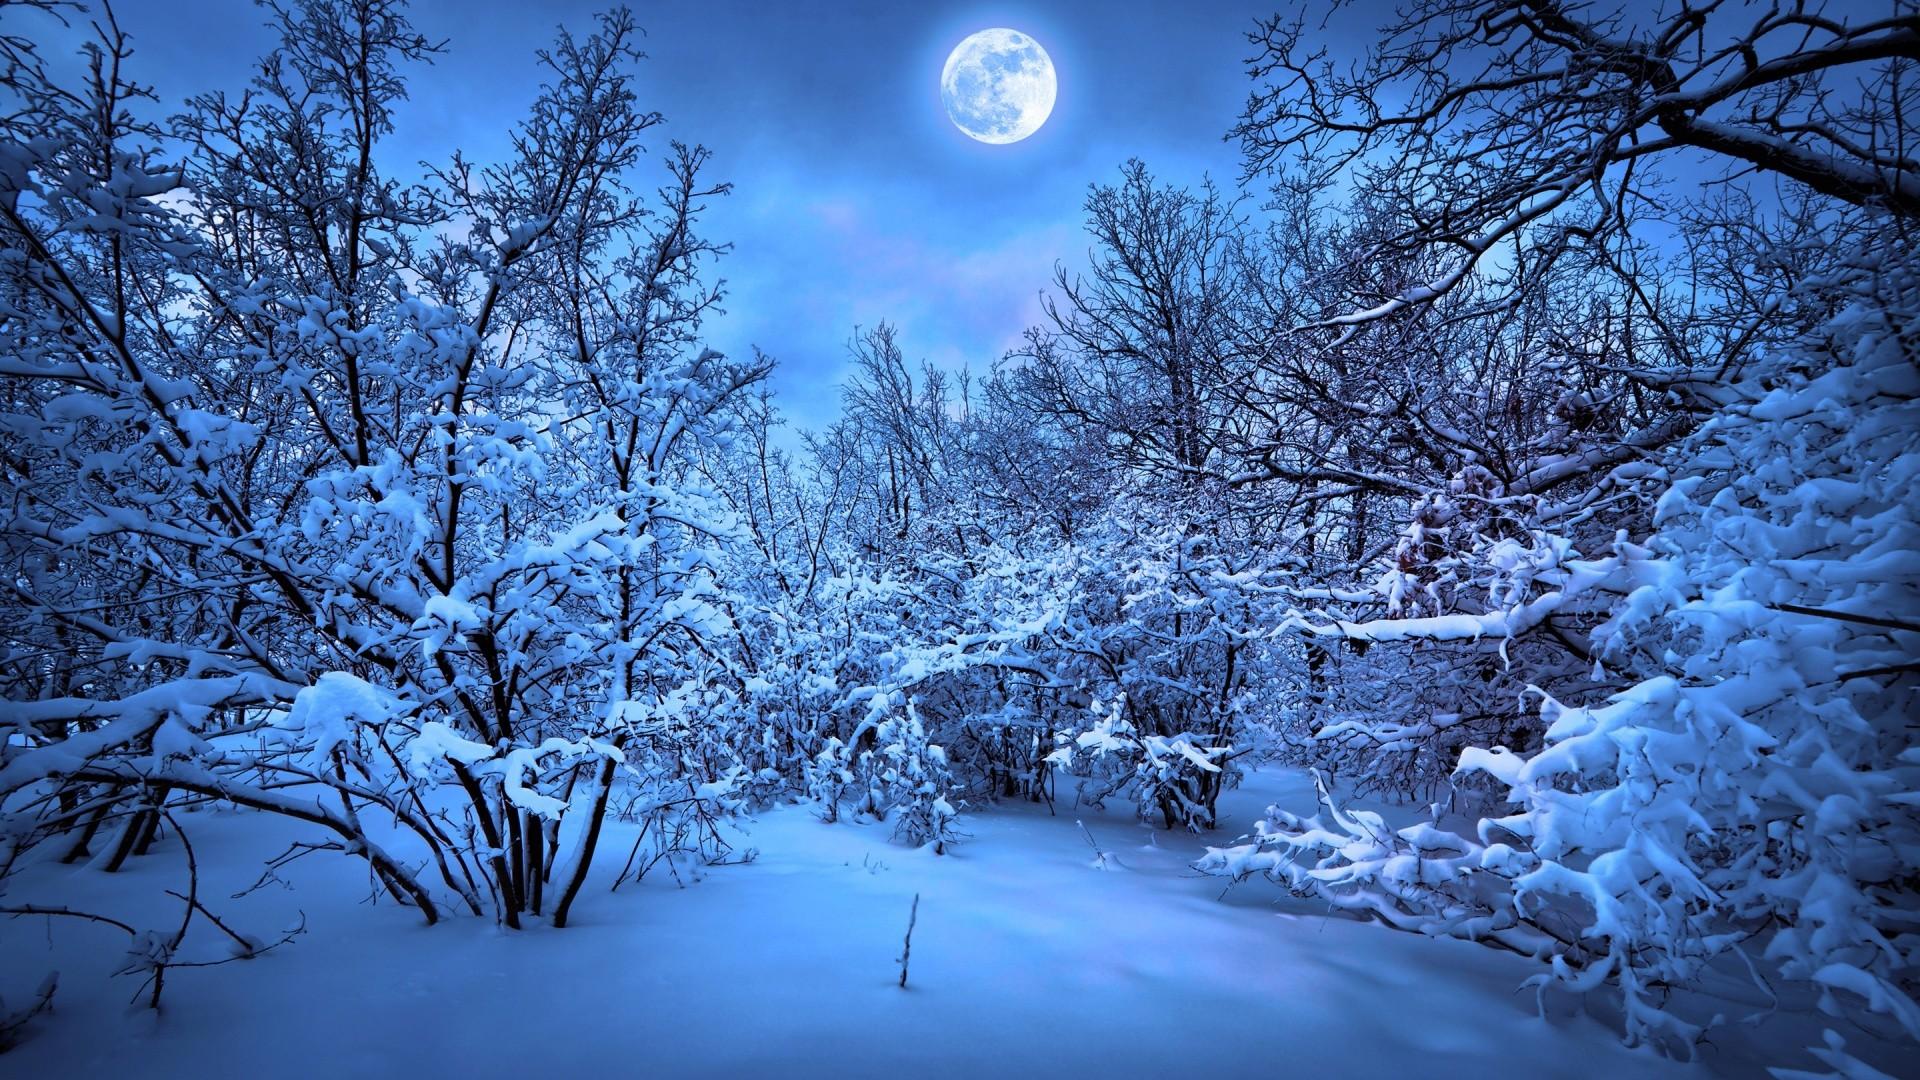 Blue Winter Forest Full Moon